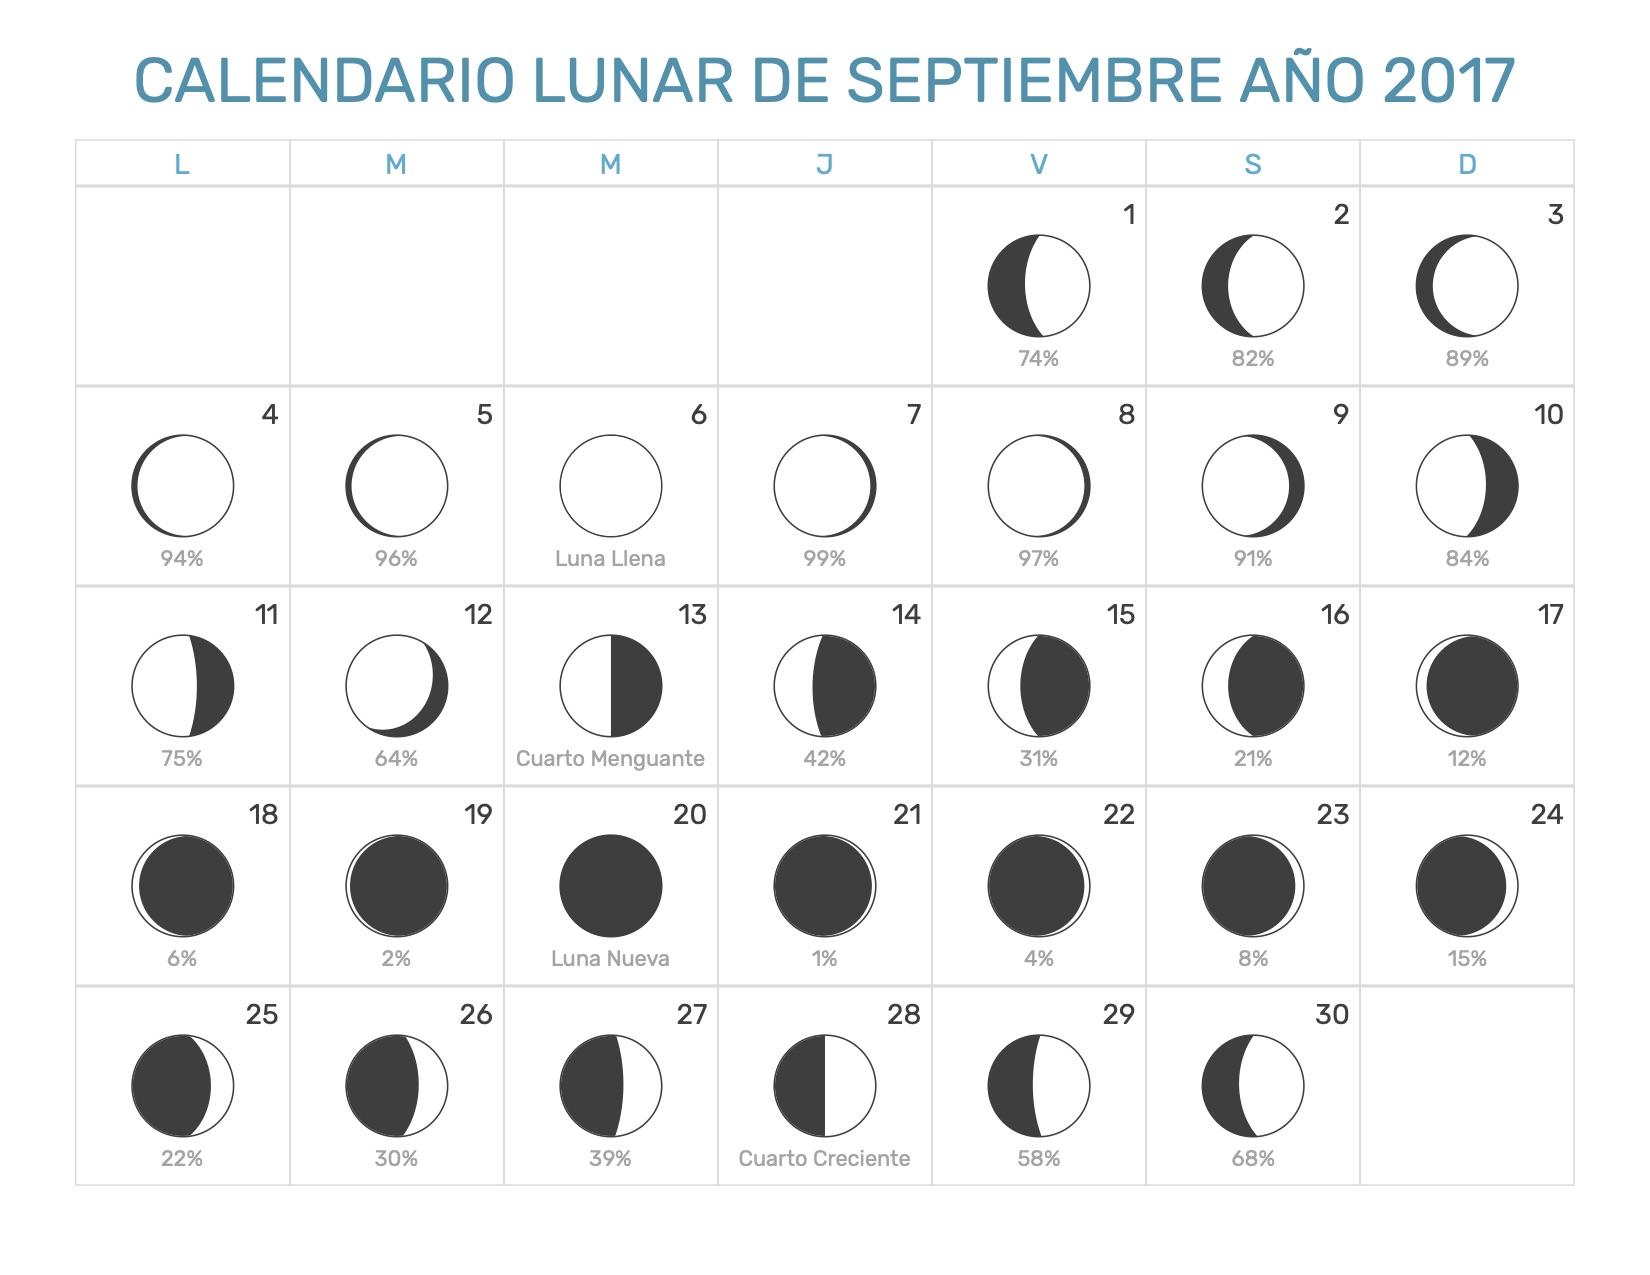 Calendario lunar septiembre 2017 for Cambios de luna 2017